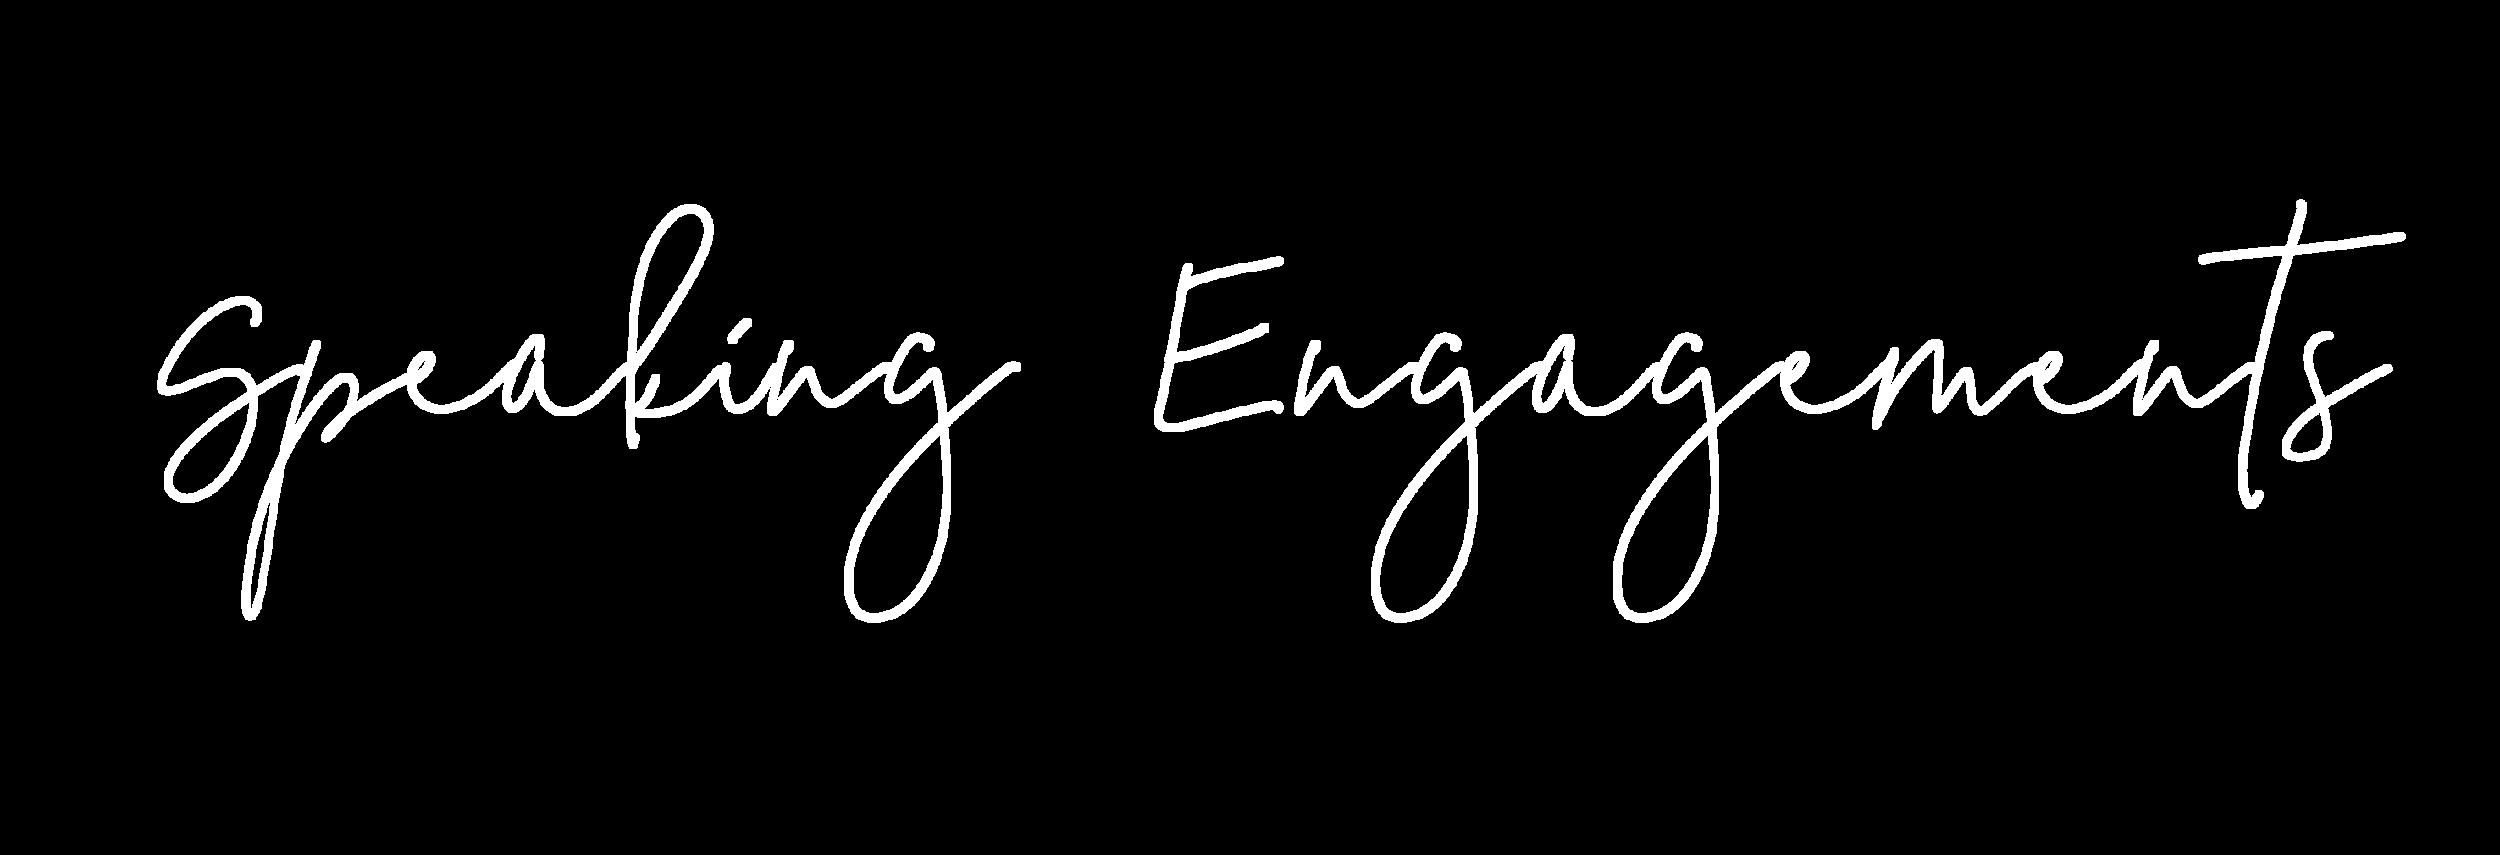 SpeakingEngagementsWhite.png